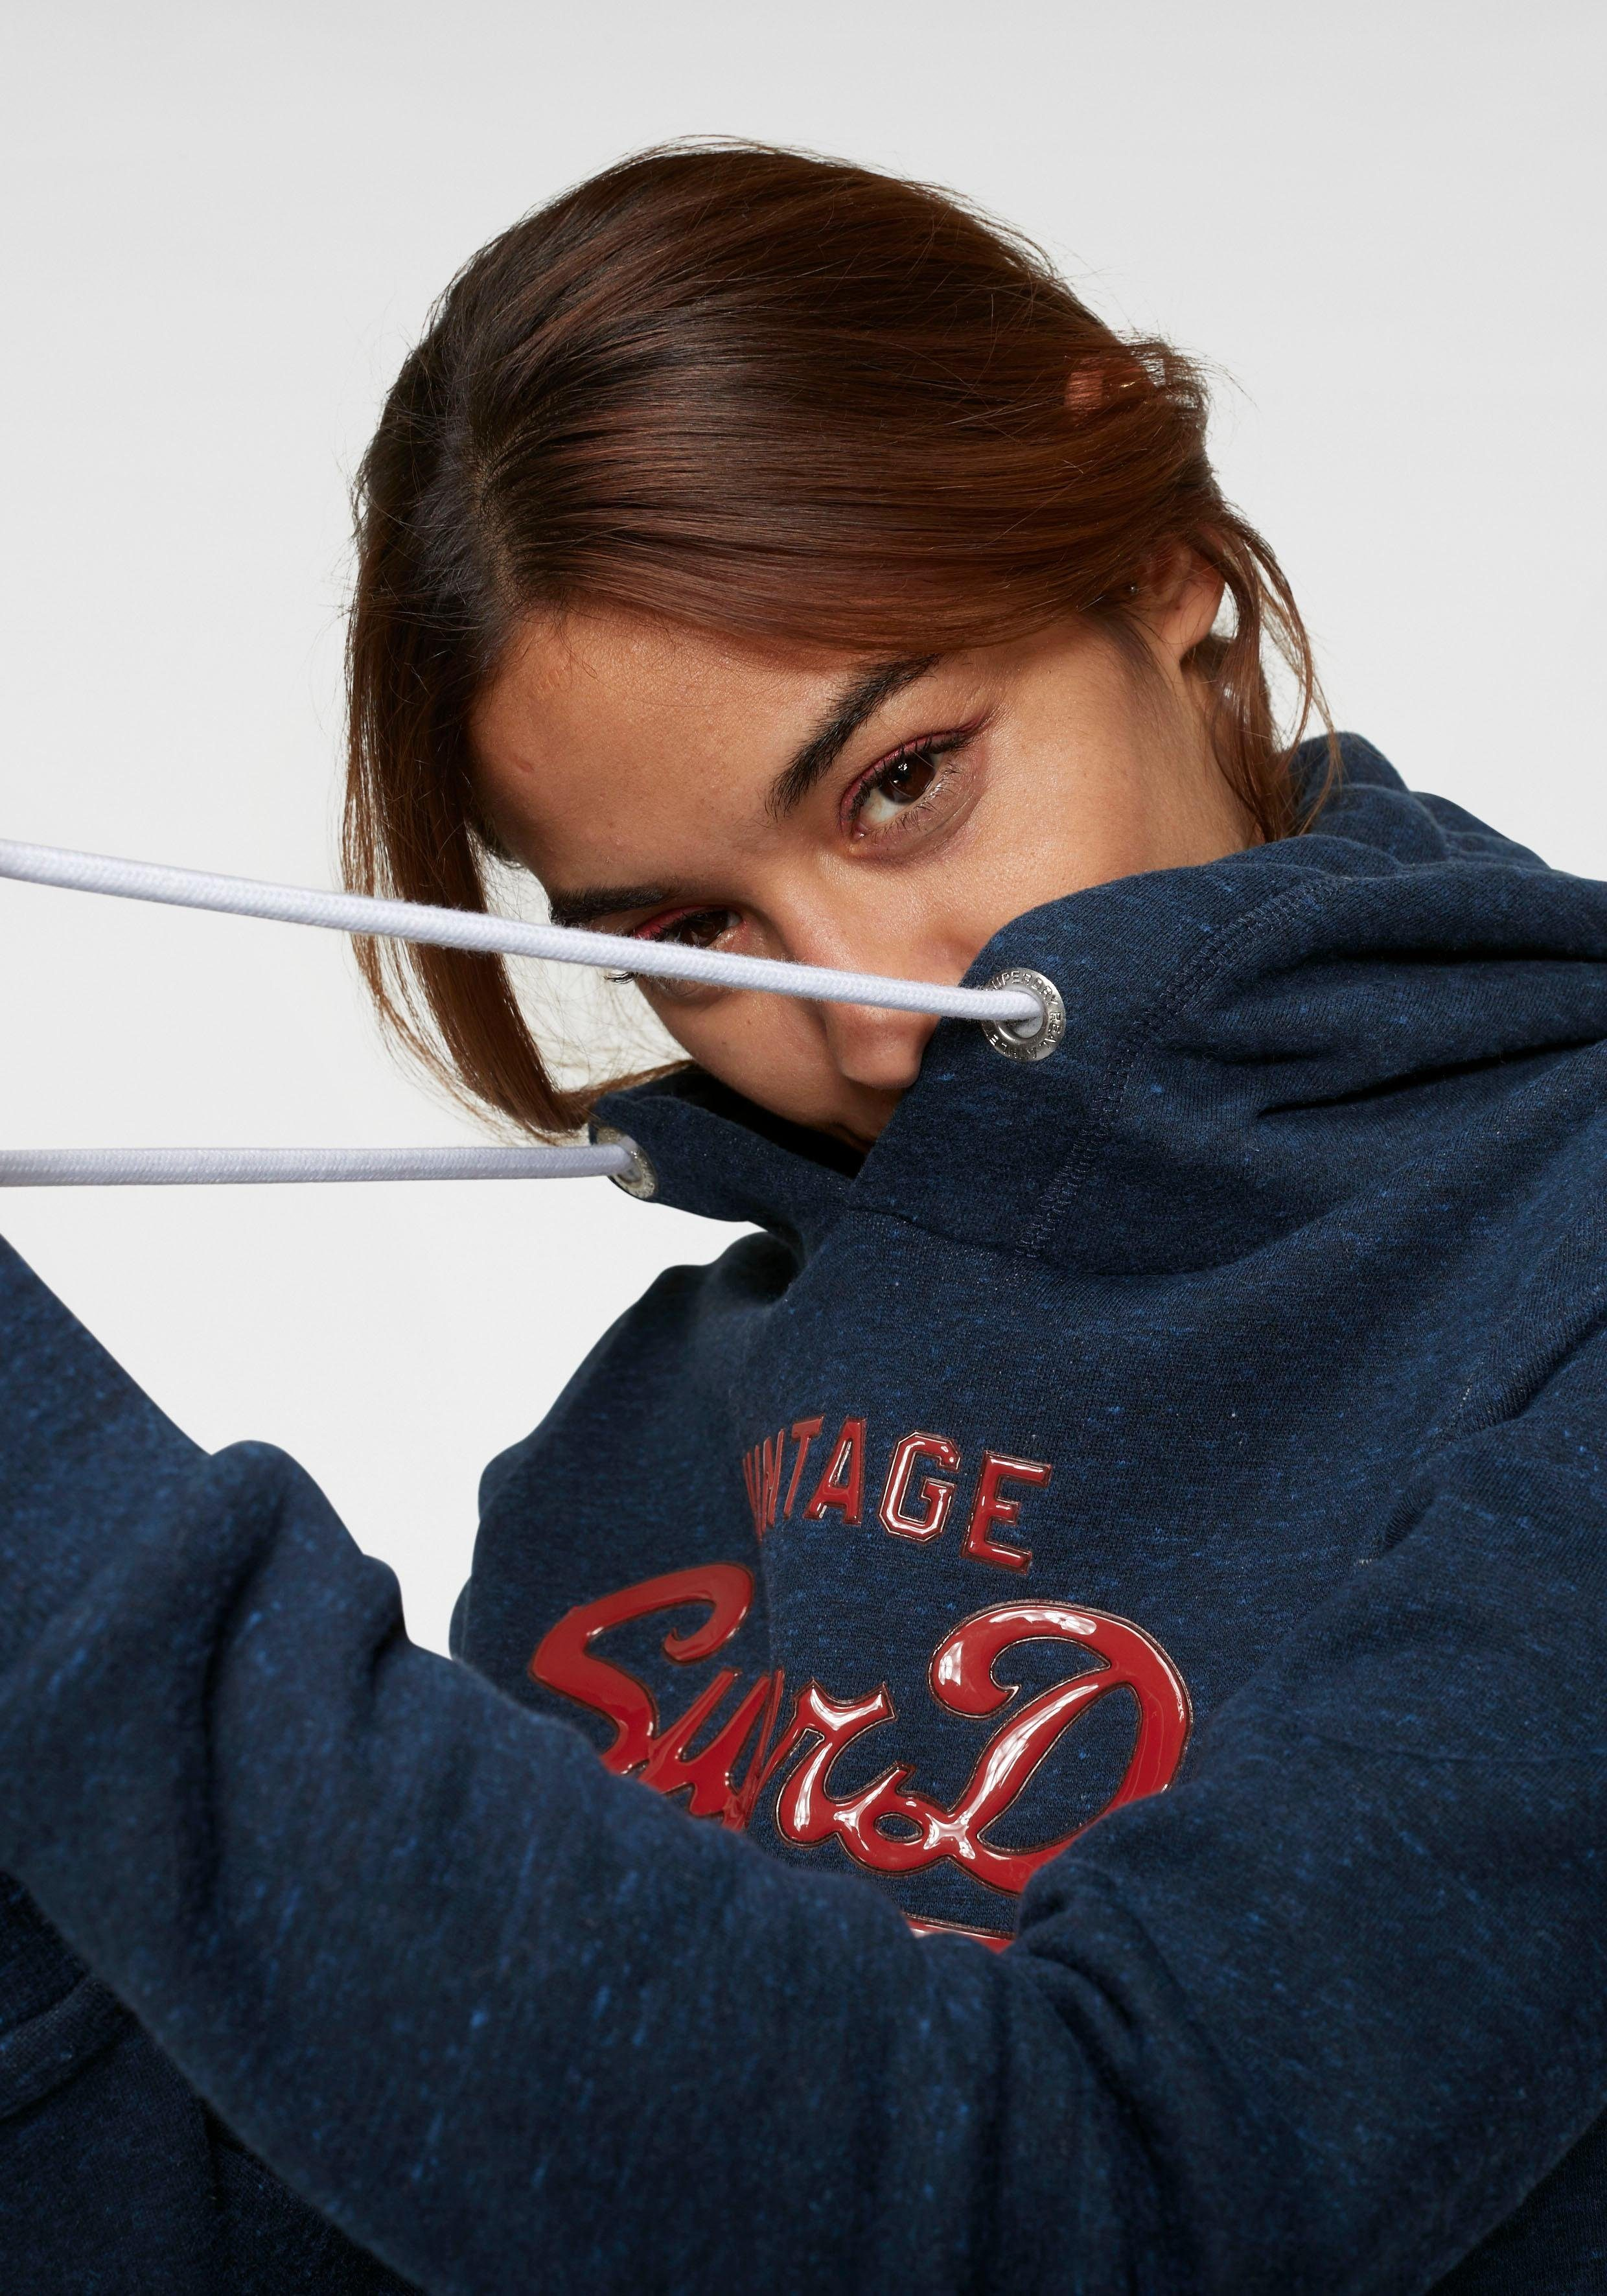 Kapuzensweatshirt Extravaganter Entry Goods Logoapplikation Kaufen Gloss Online »premium Hood« Superdry Mit 5AjLS4Rc3q